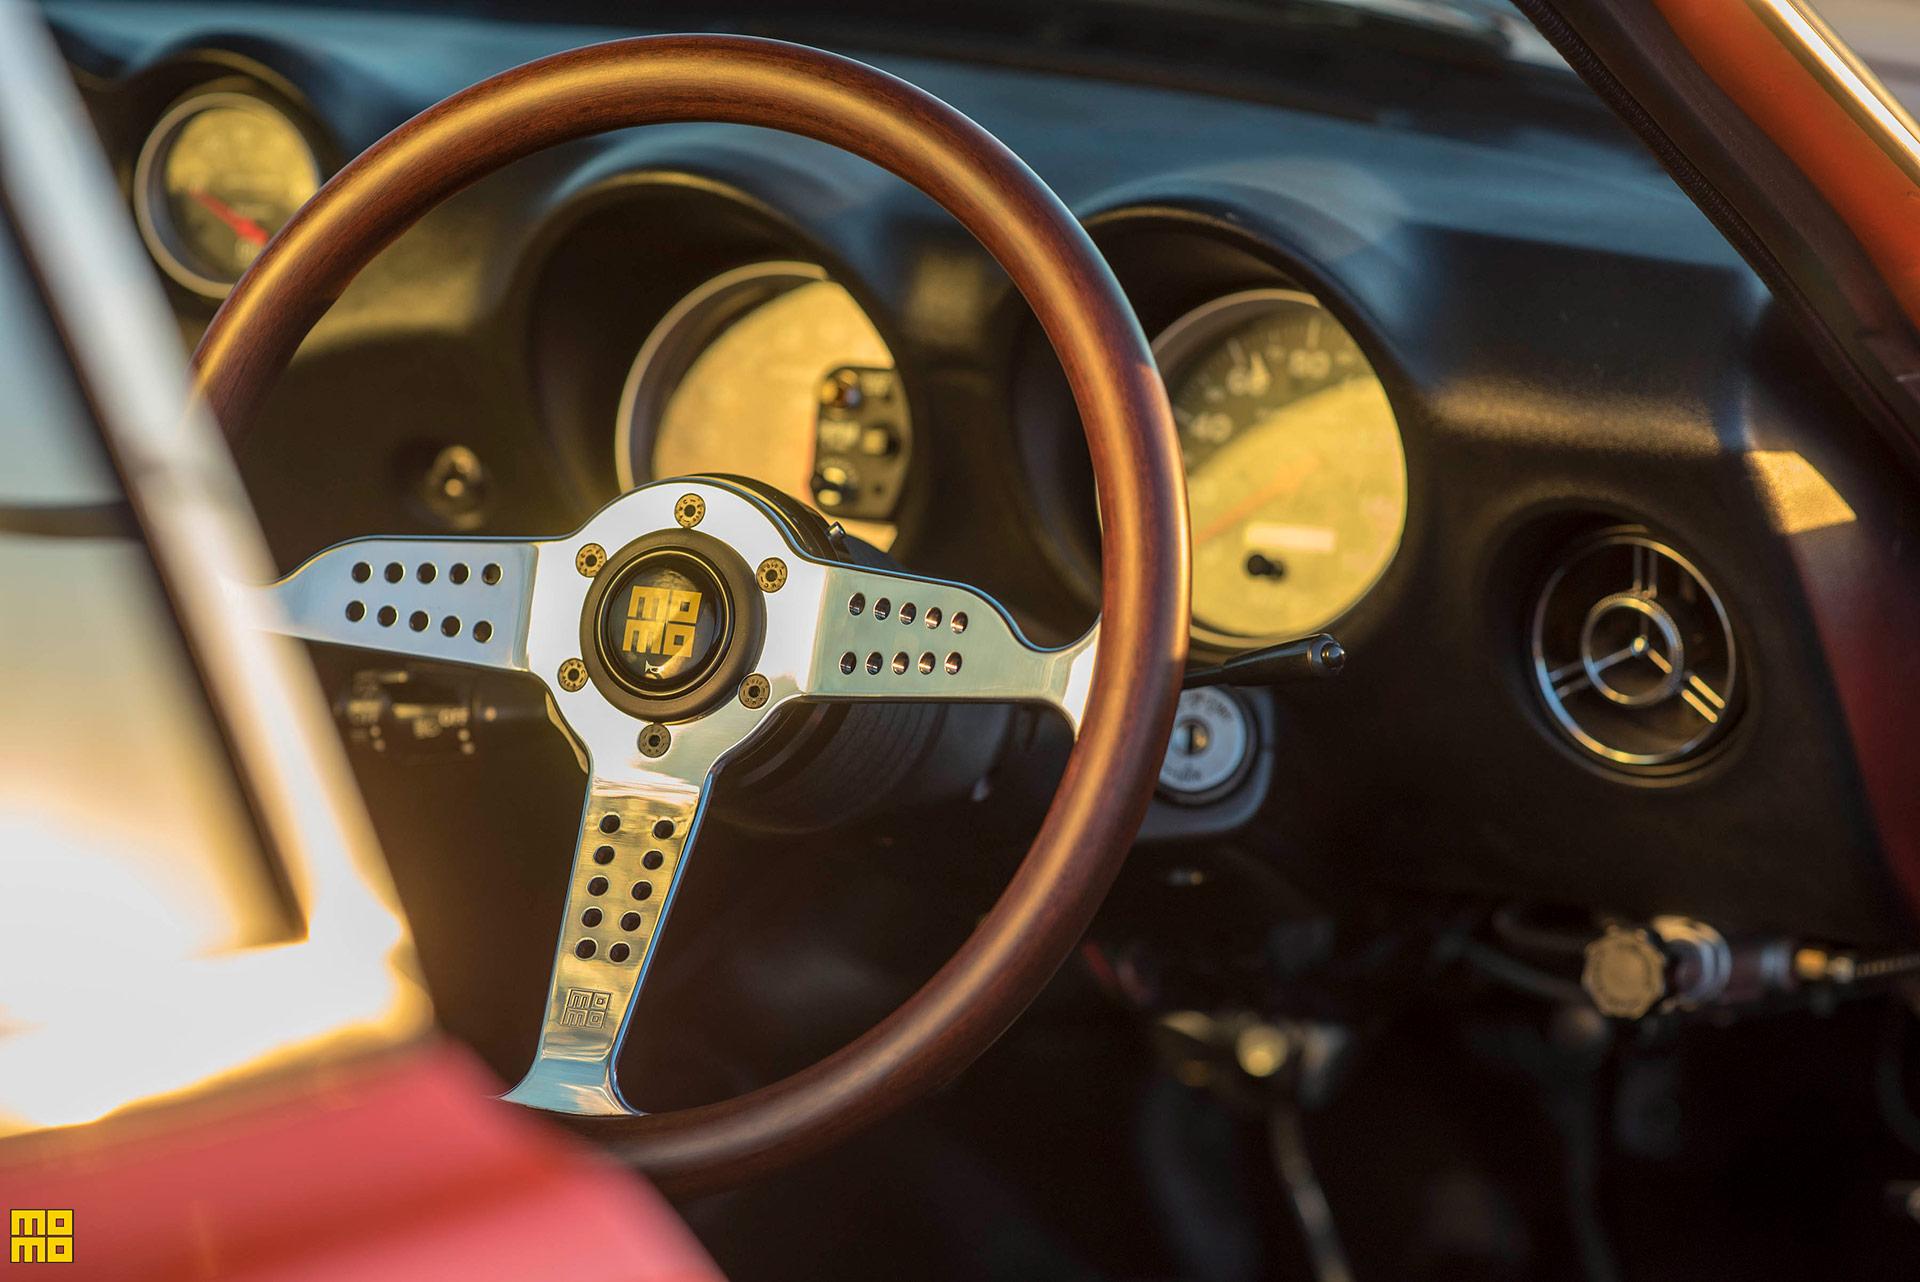 Datsun Fairlady 240Z Featuring a MOMO Super Grand Prix Steering Wheel